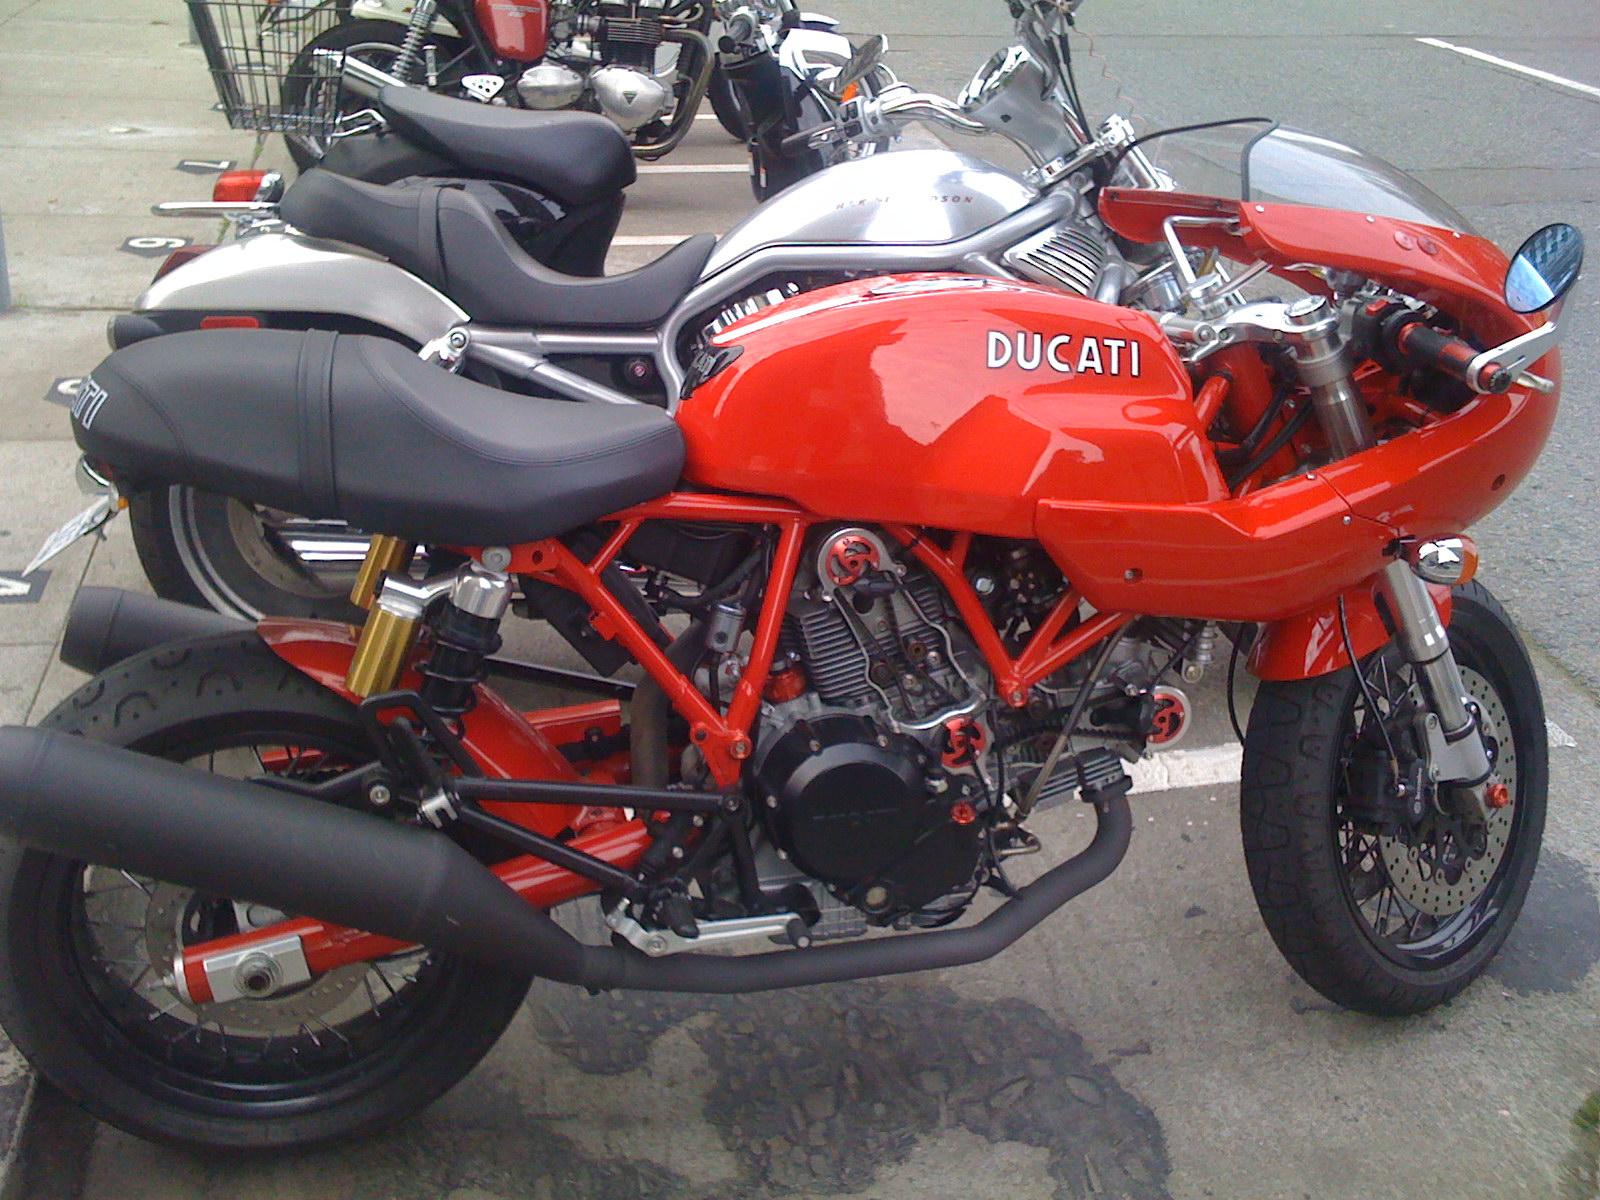 Ducati  Spark Plug Replacement